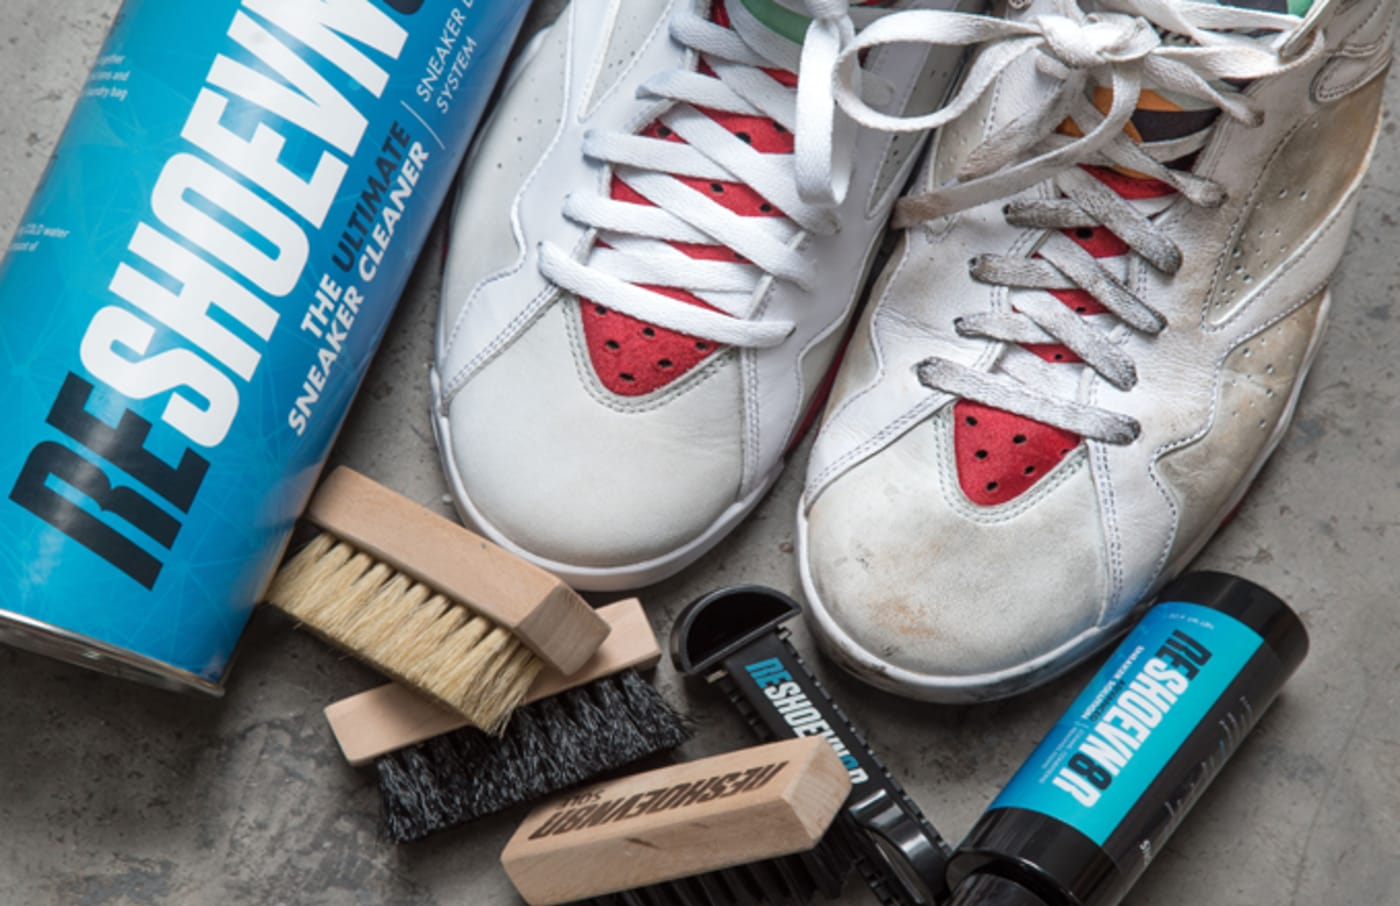 Reshoevn8r Shoe Cleaner Image